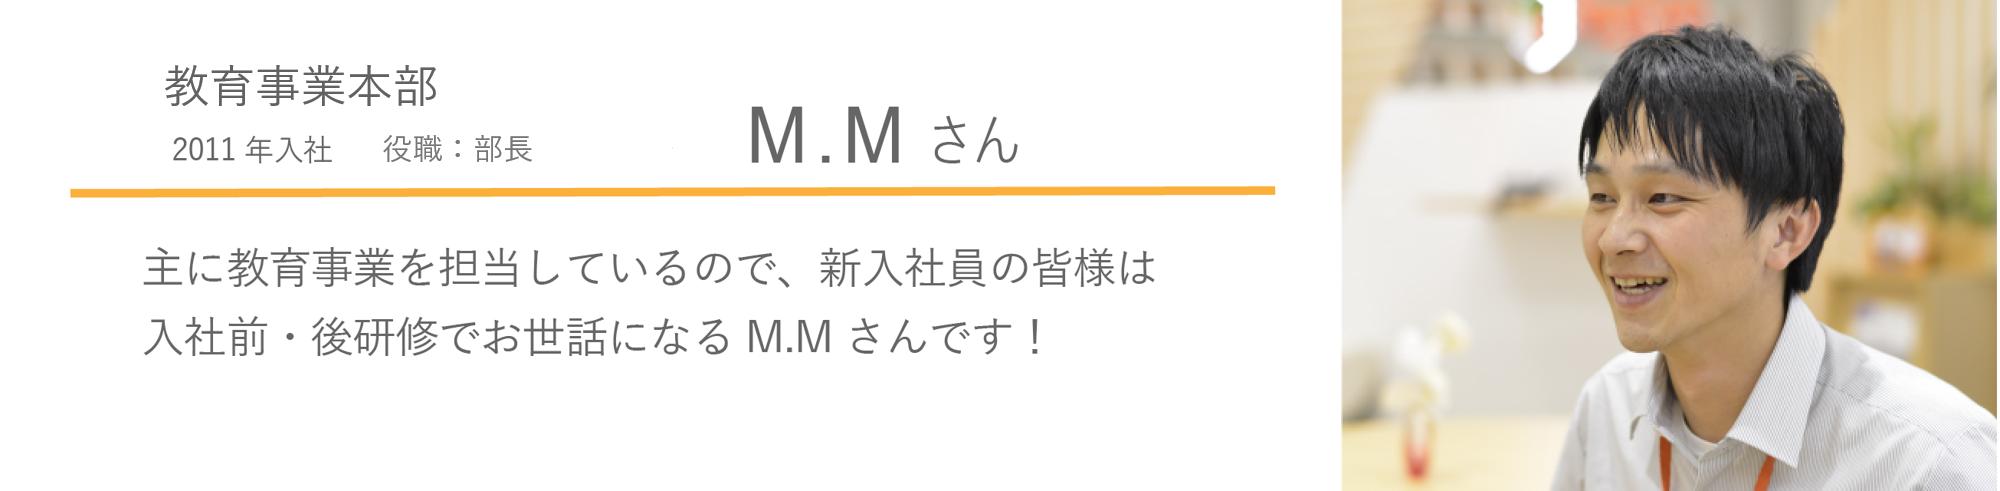 社員紹介3